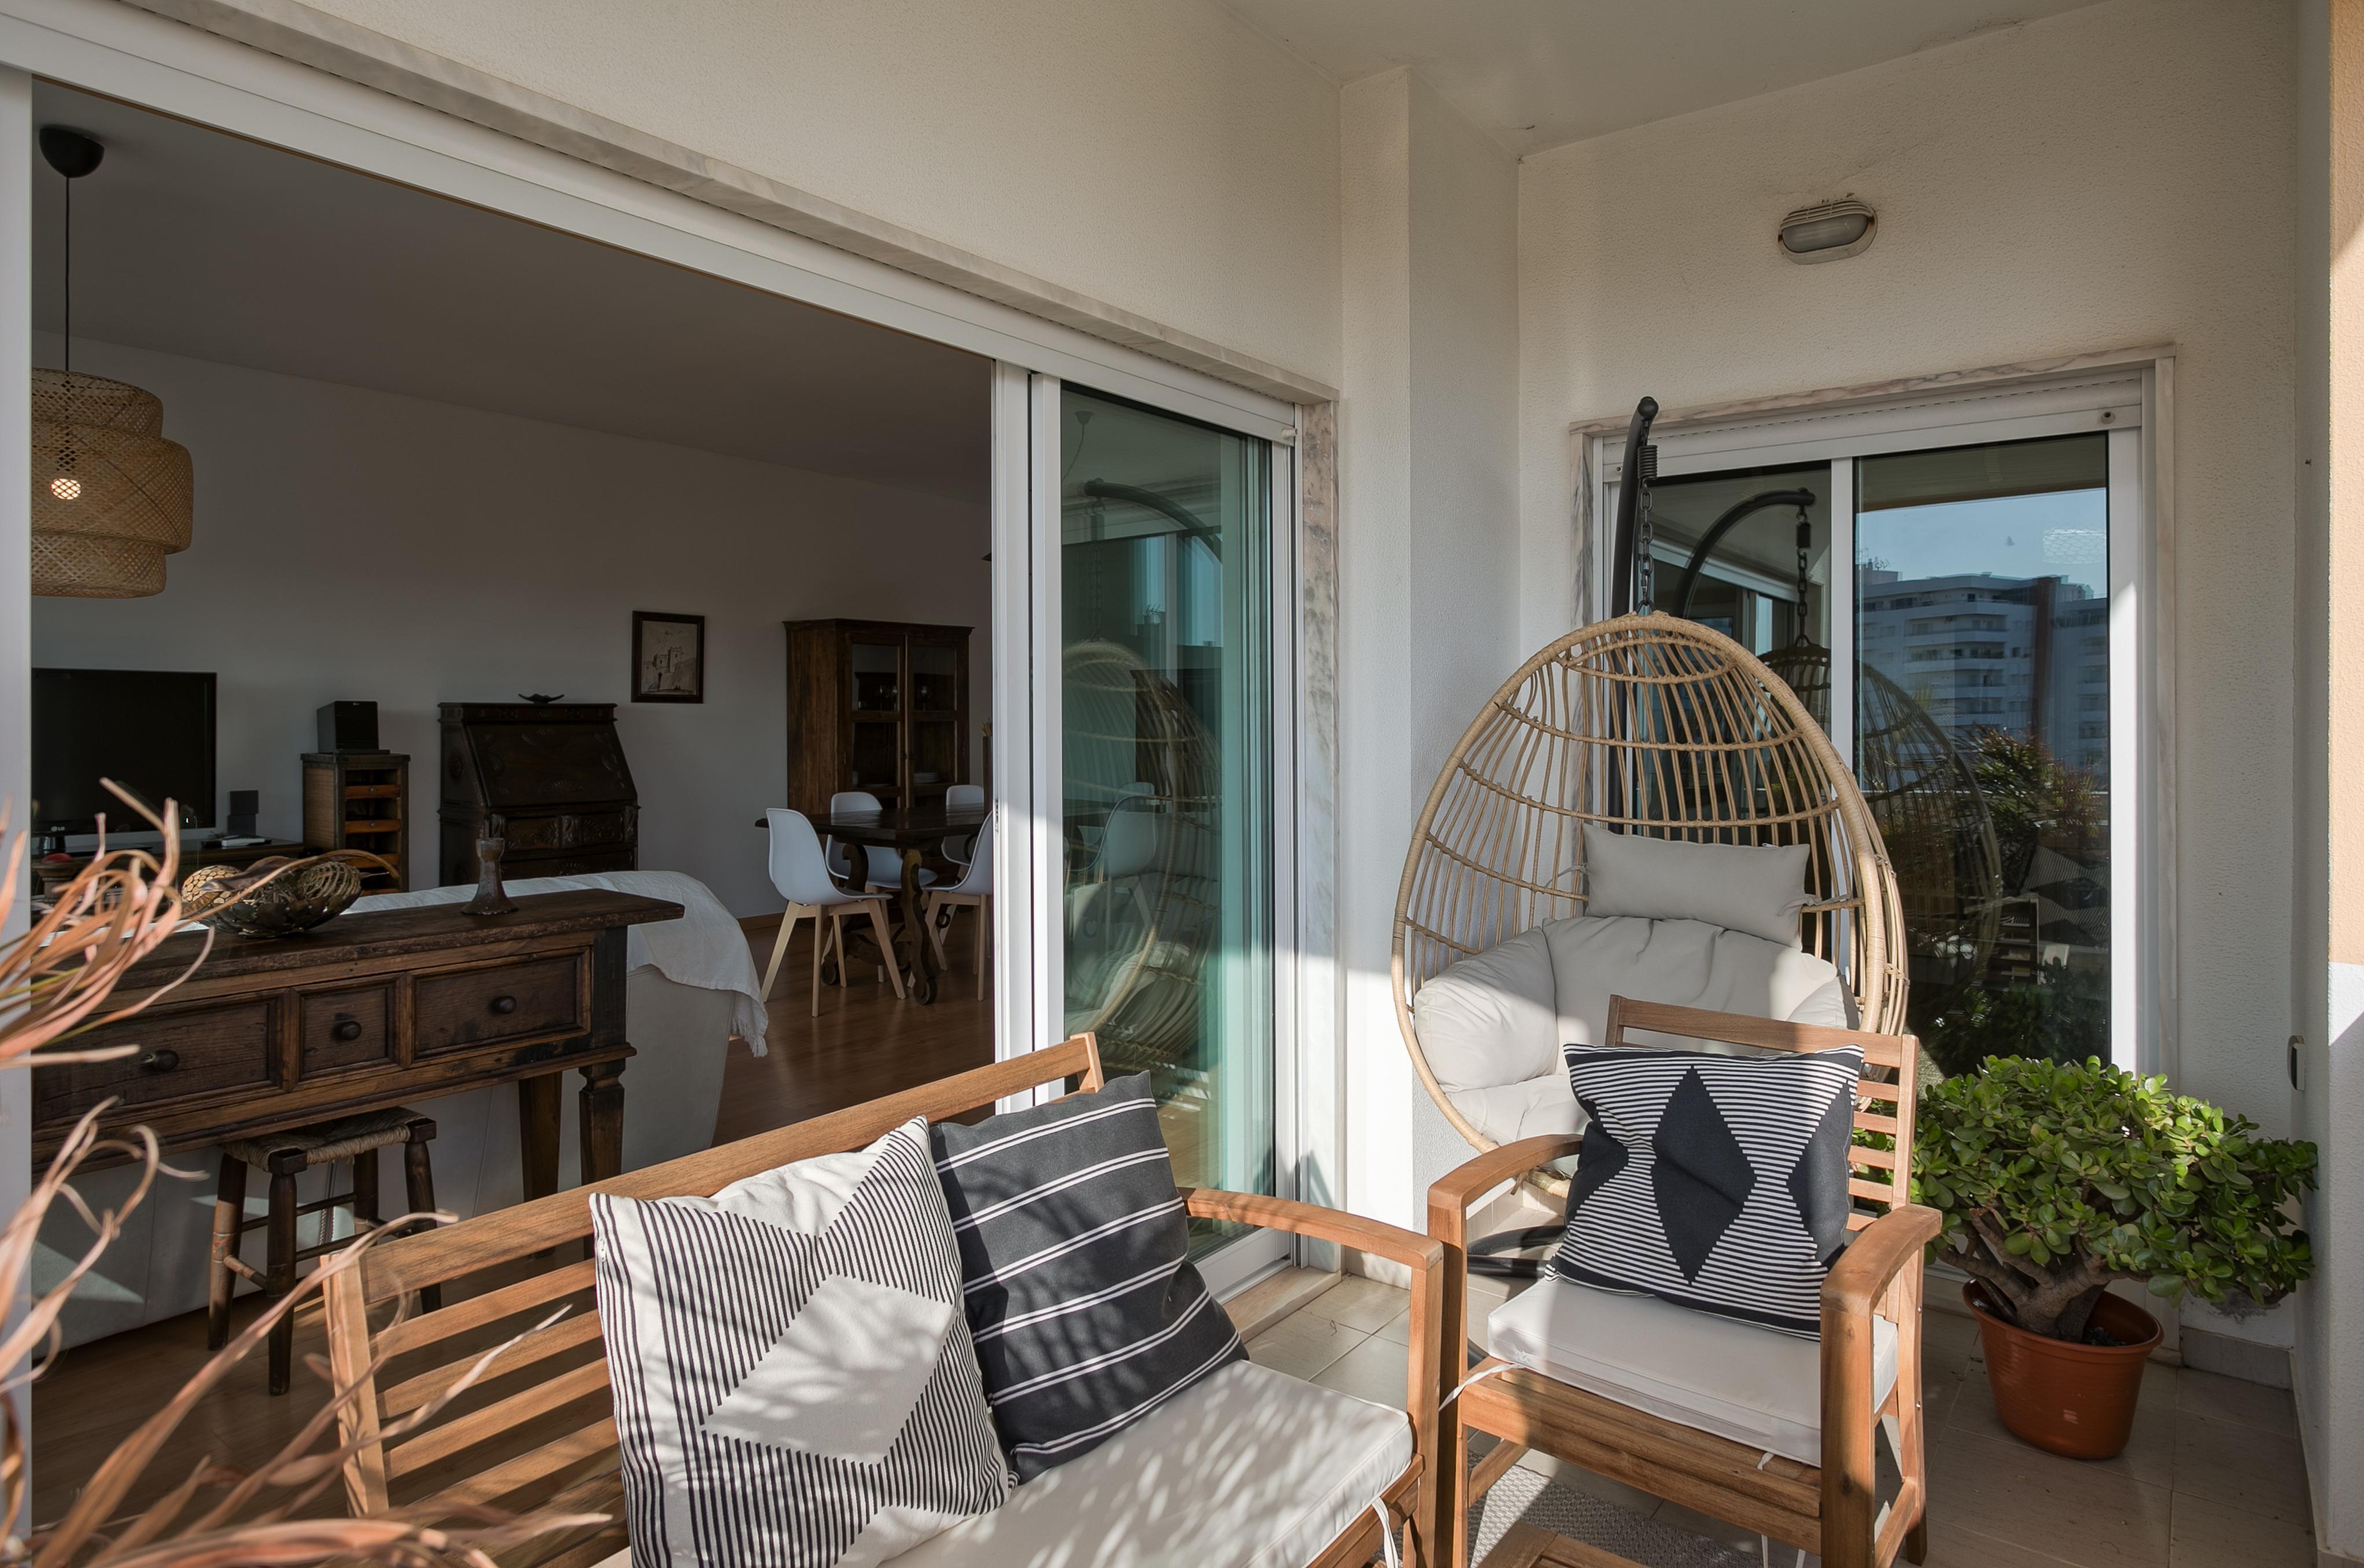 decoracao-alojamento-local-portimao-varanda